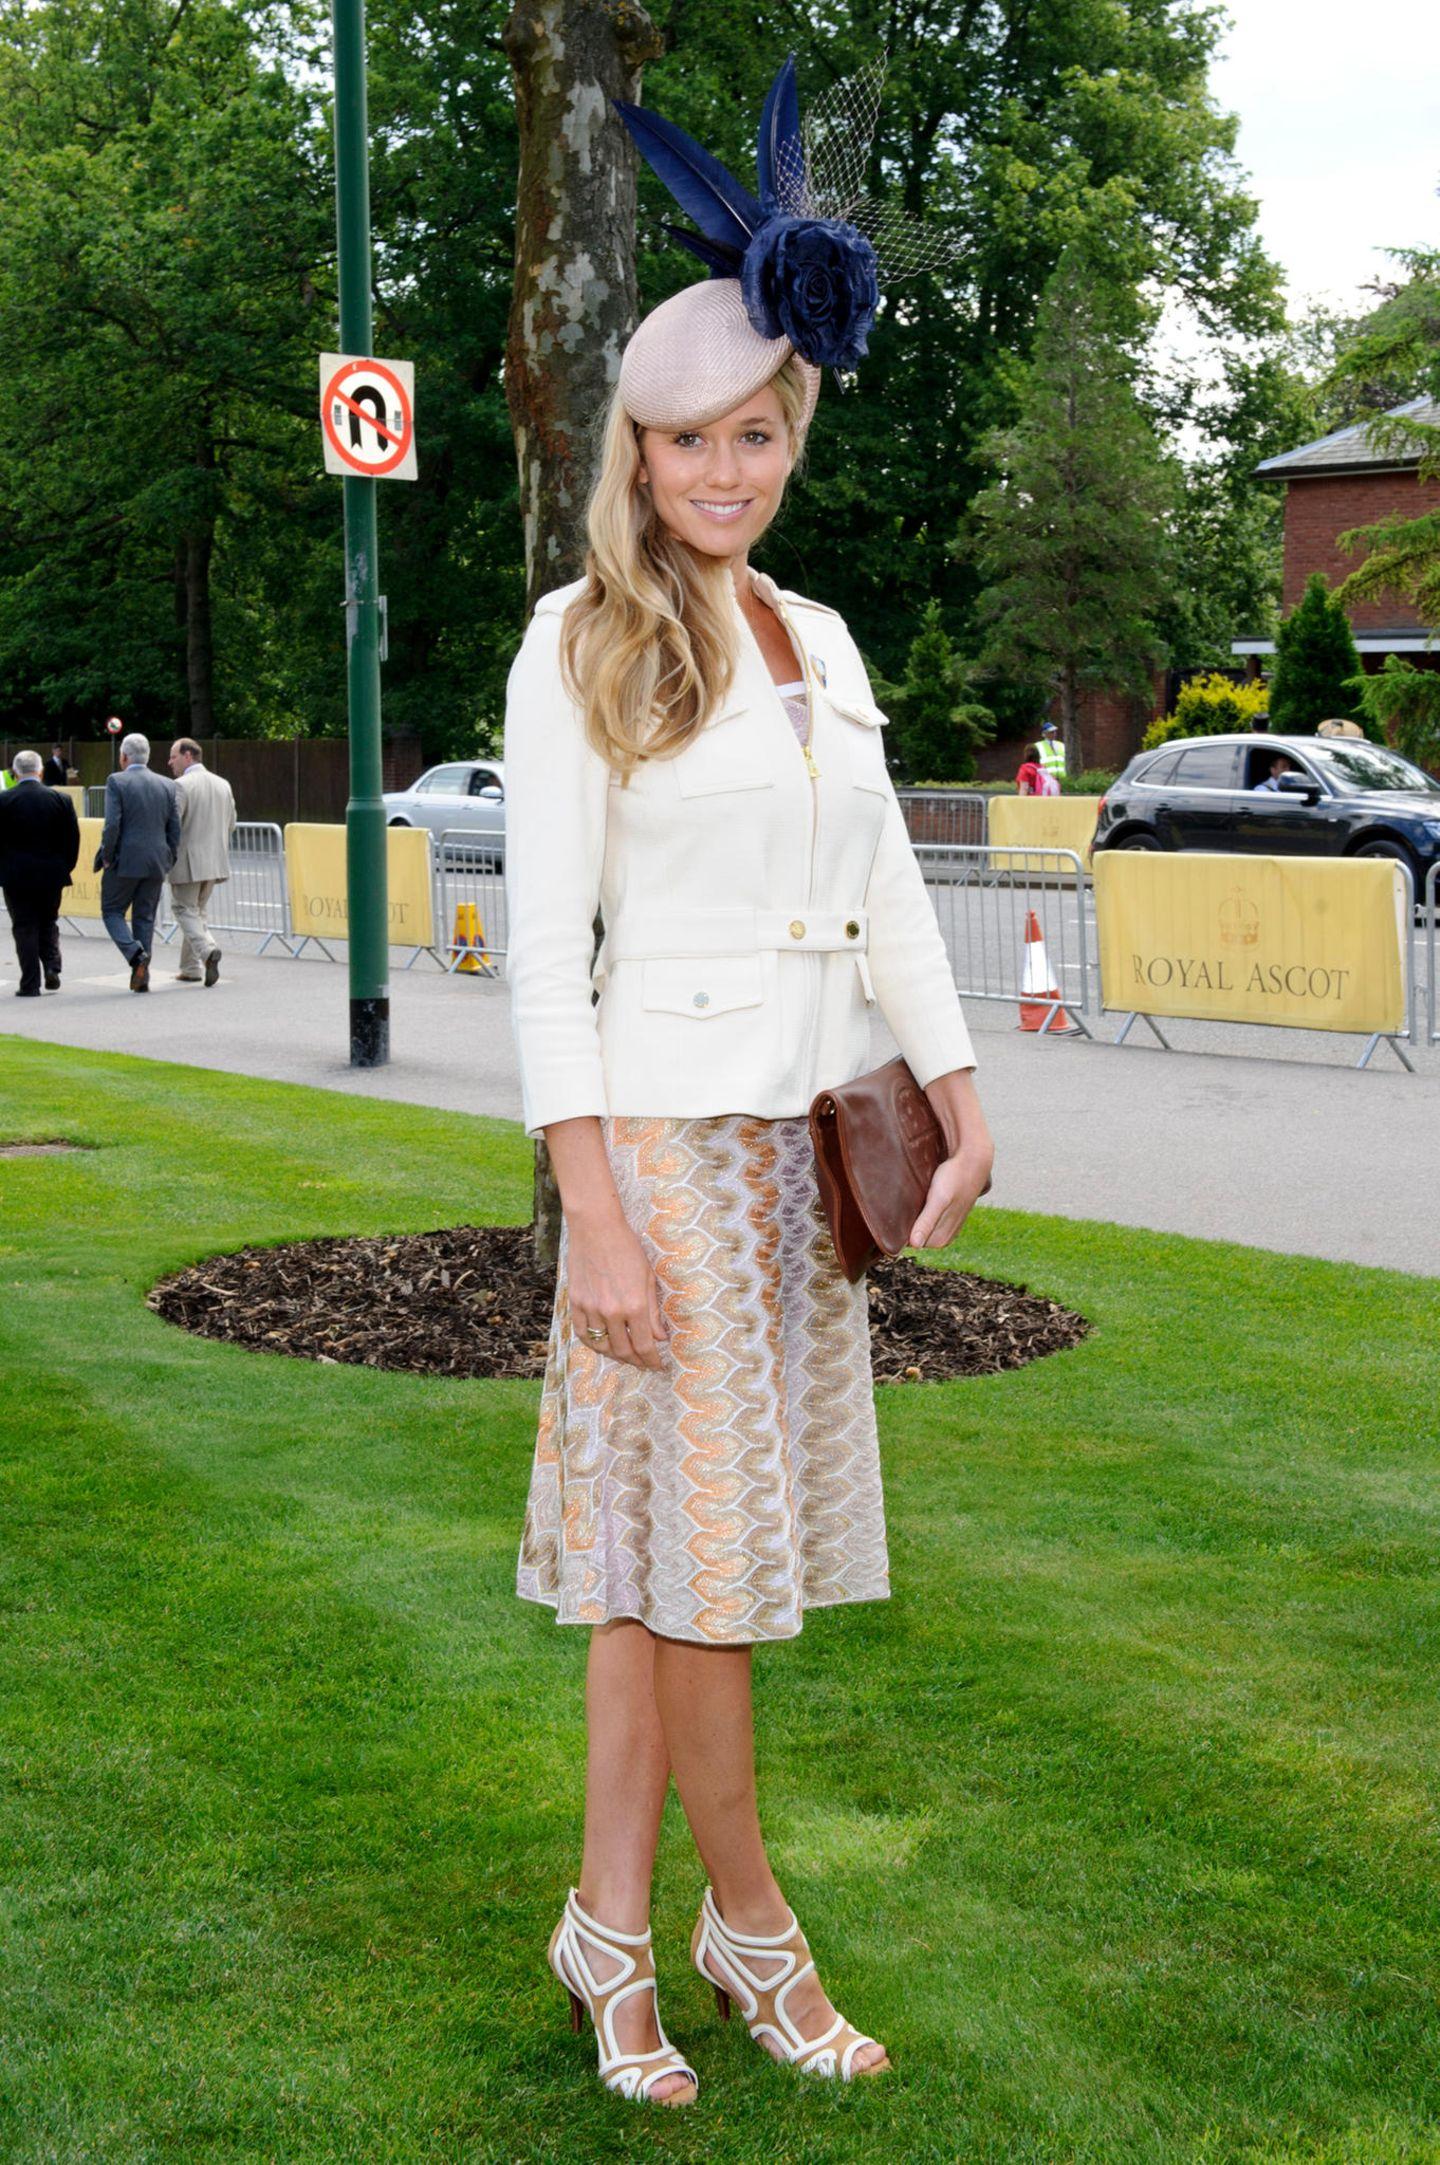 Prinz Harrys Ex-Freundinnen: Florence Brudenell-Bruce mit Hut